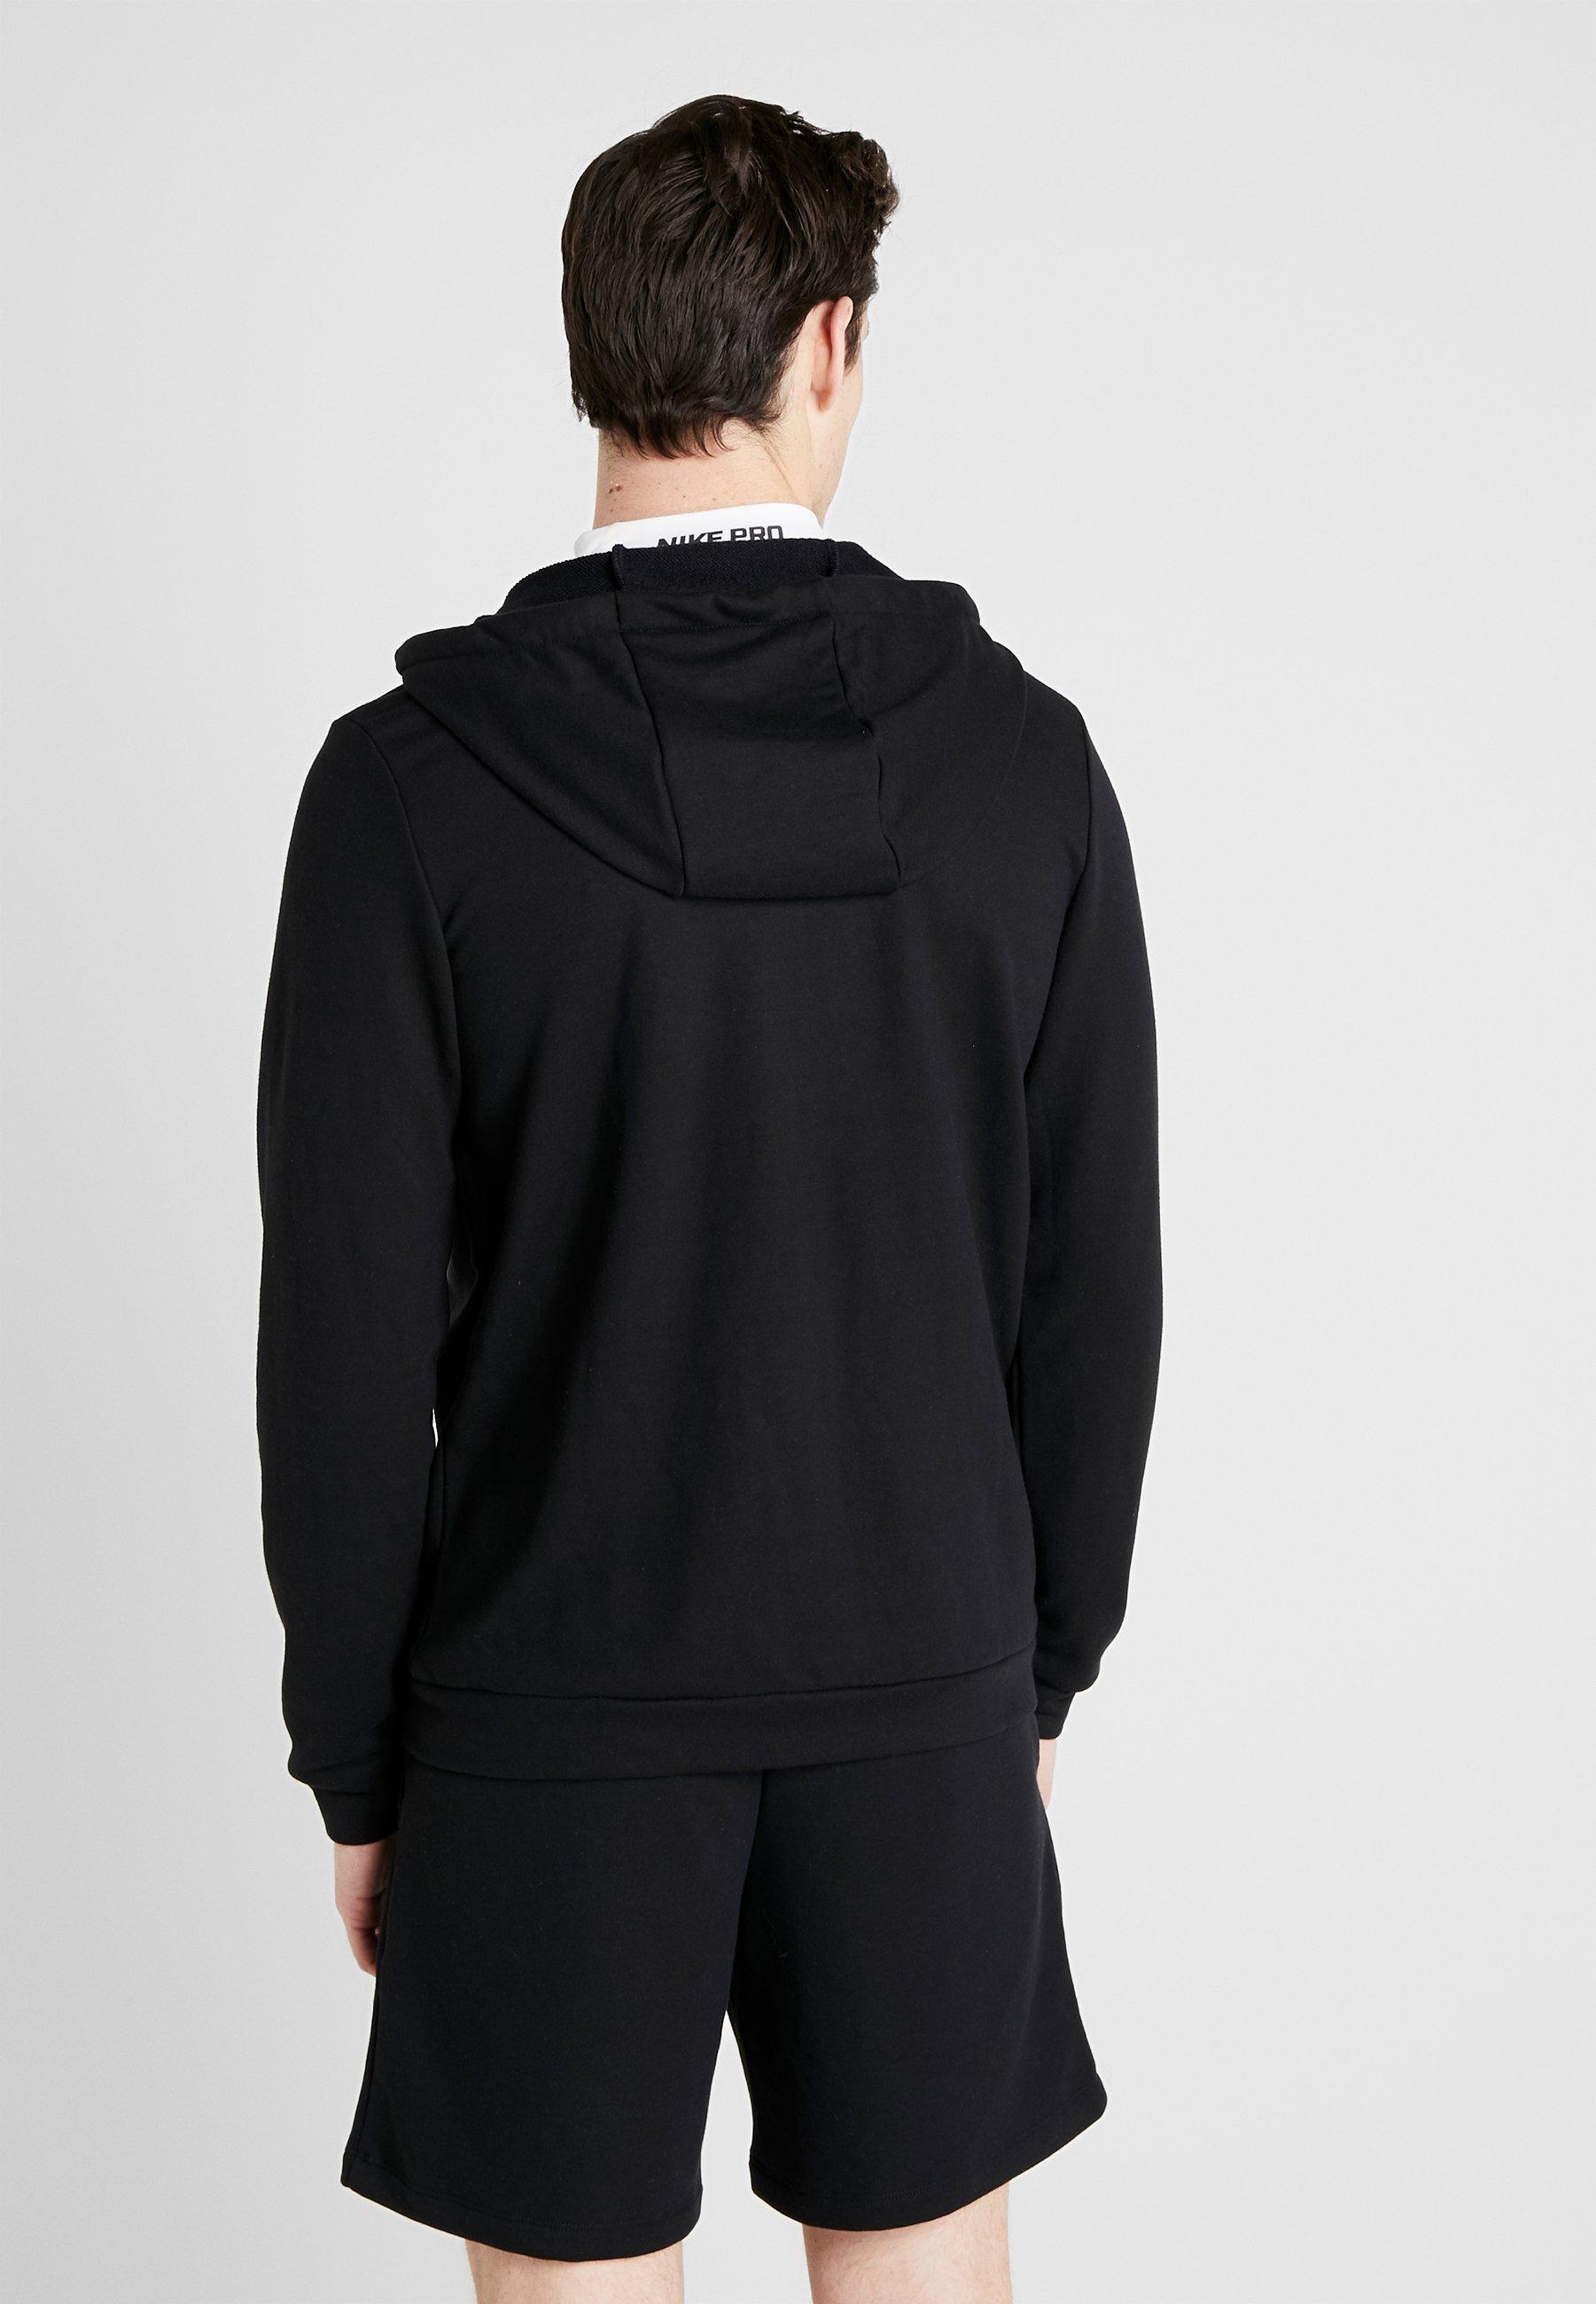 Recommend Discount Good Service Men's Clothing Nike Performance DRY HOODIE  Zip-up hoodie black/white u7KJjt3Fc wPZFNsrCQ